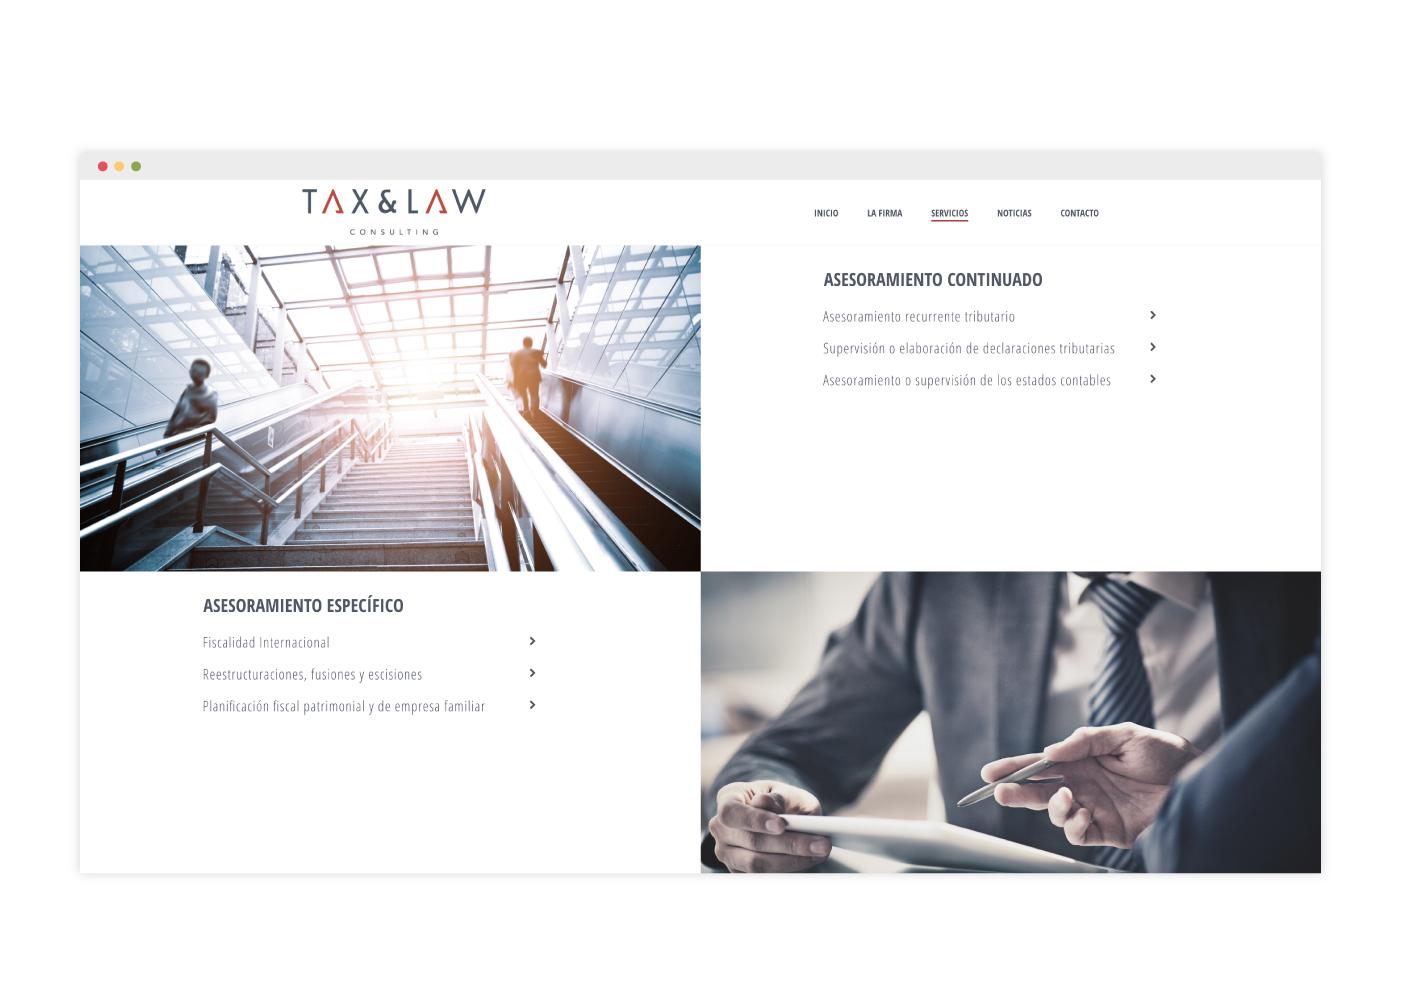 diseno-programacion-web-abogados-malaga-tax-law-7